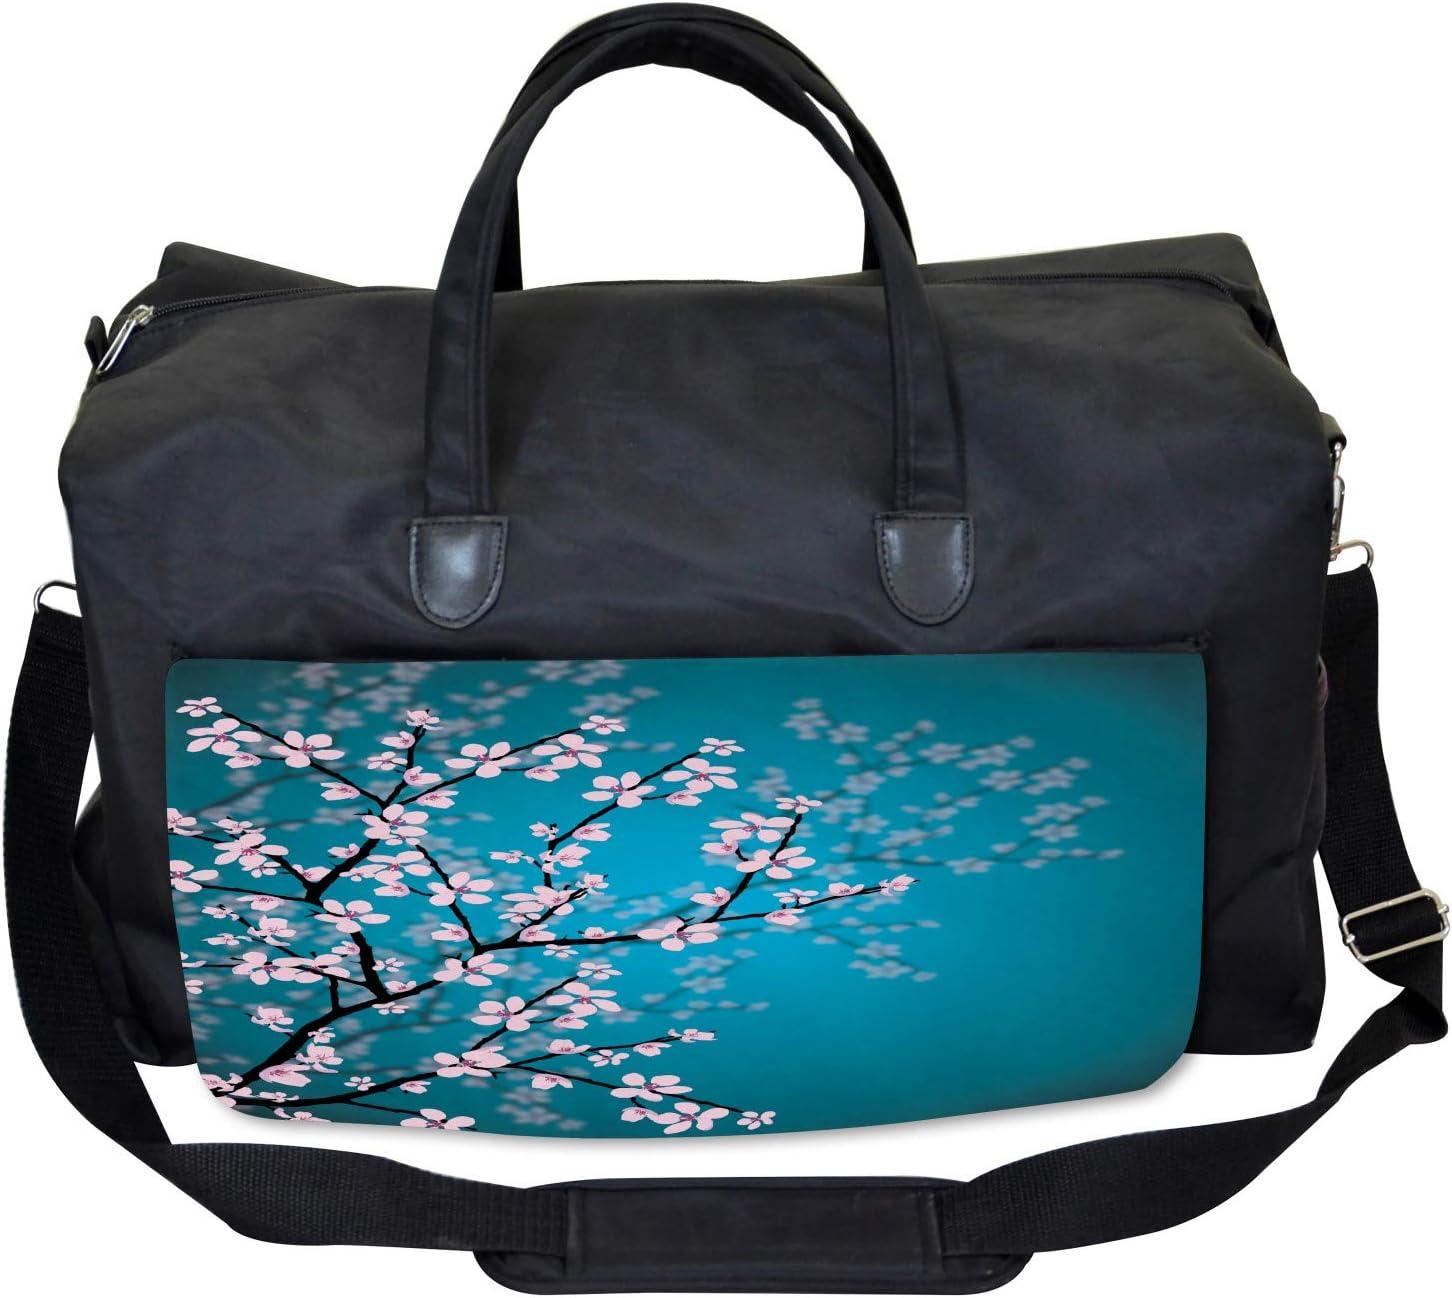 Ambesonne Japanese Gym Bag Sakura Bloom Pattern Large Weekender Carry-on